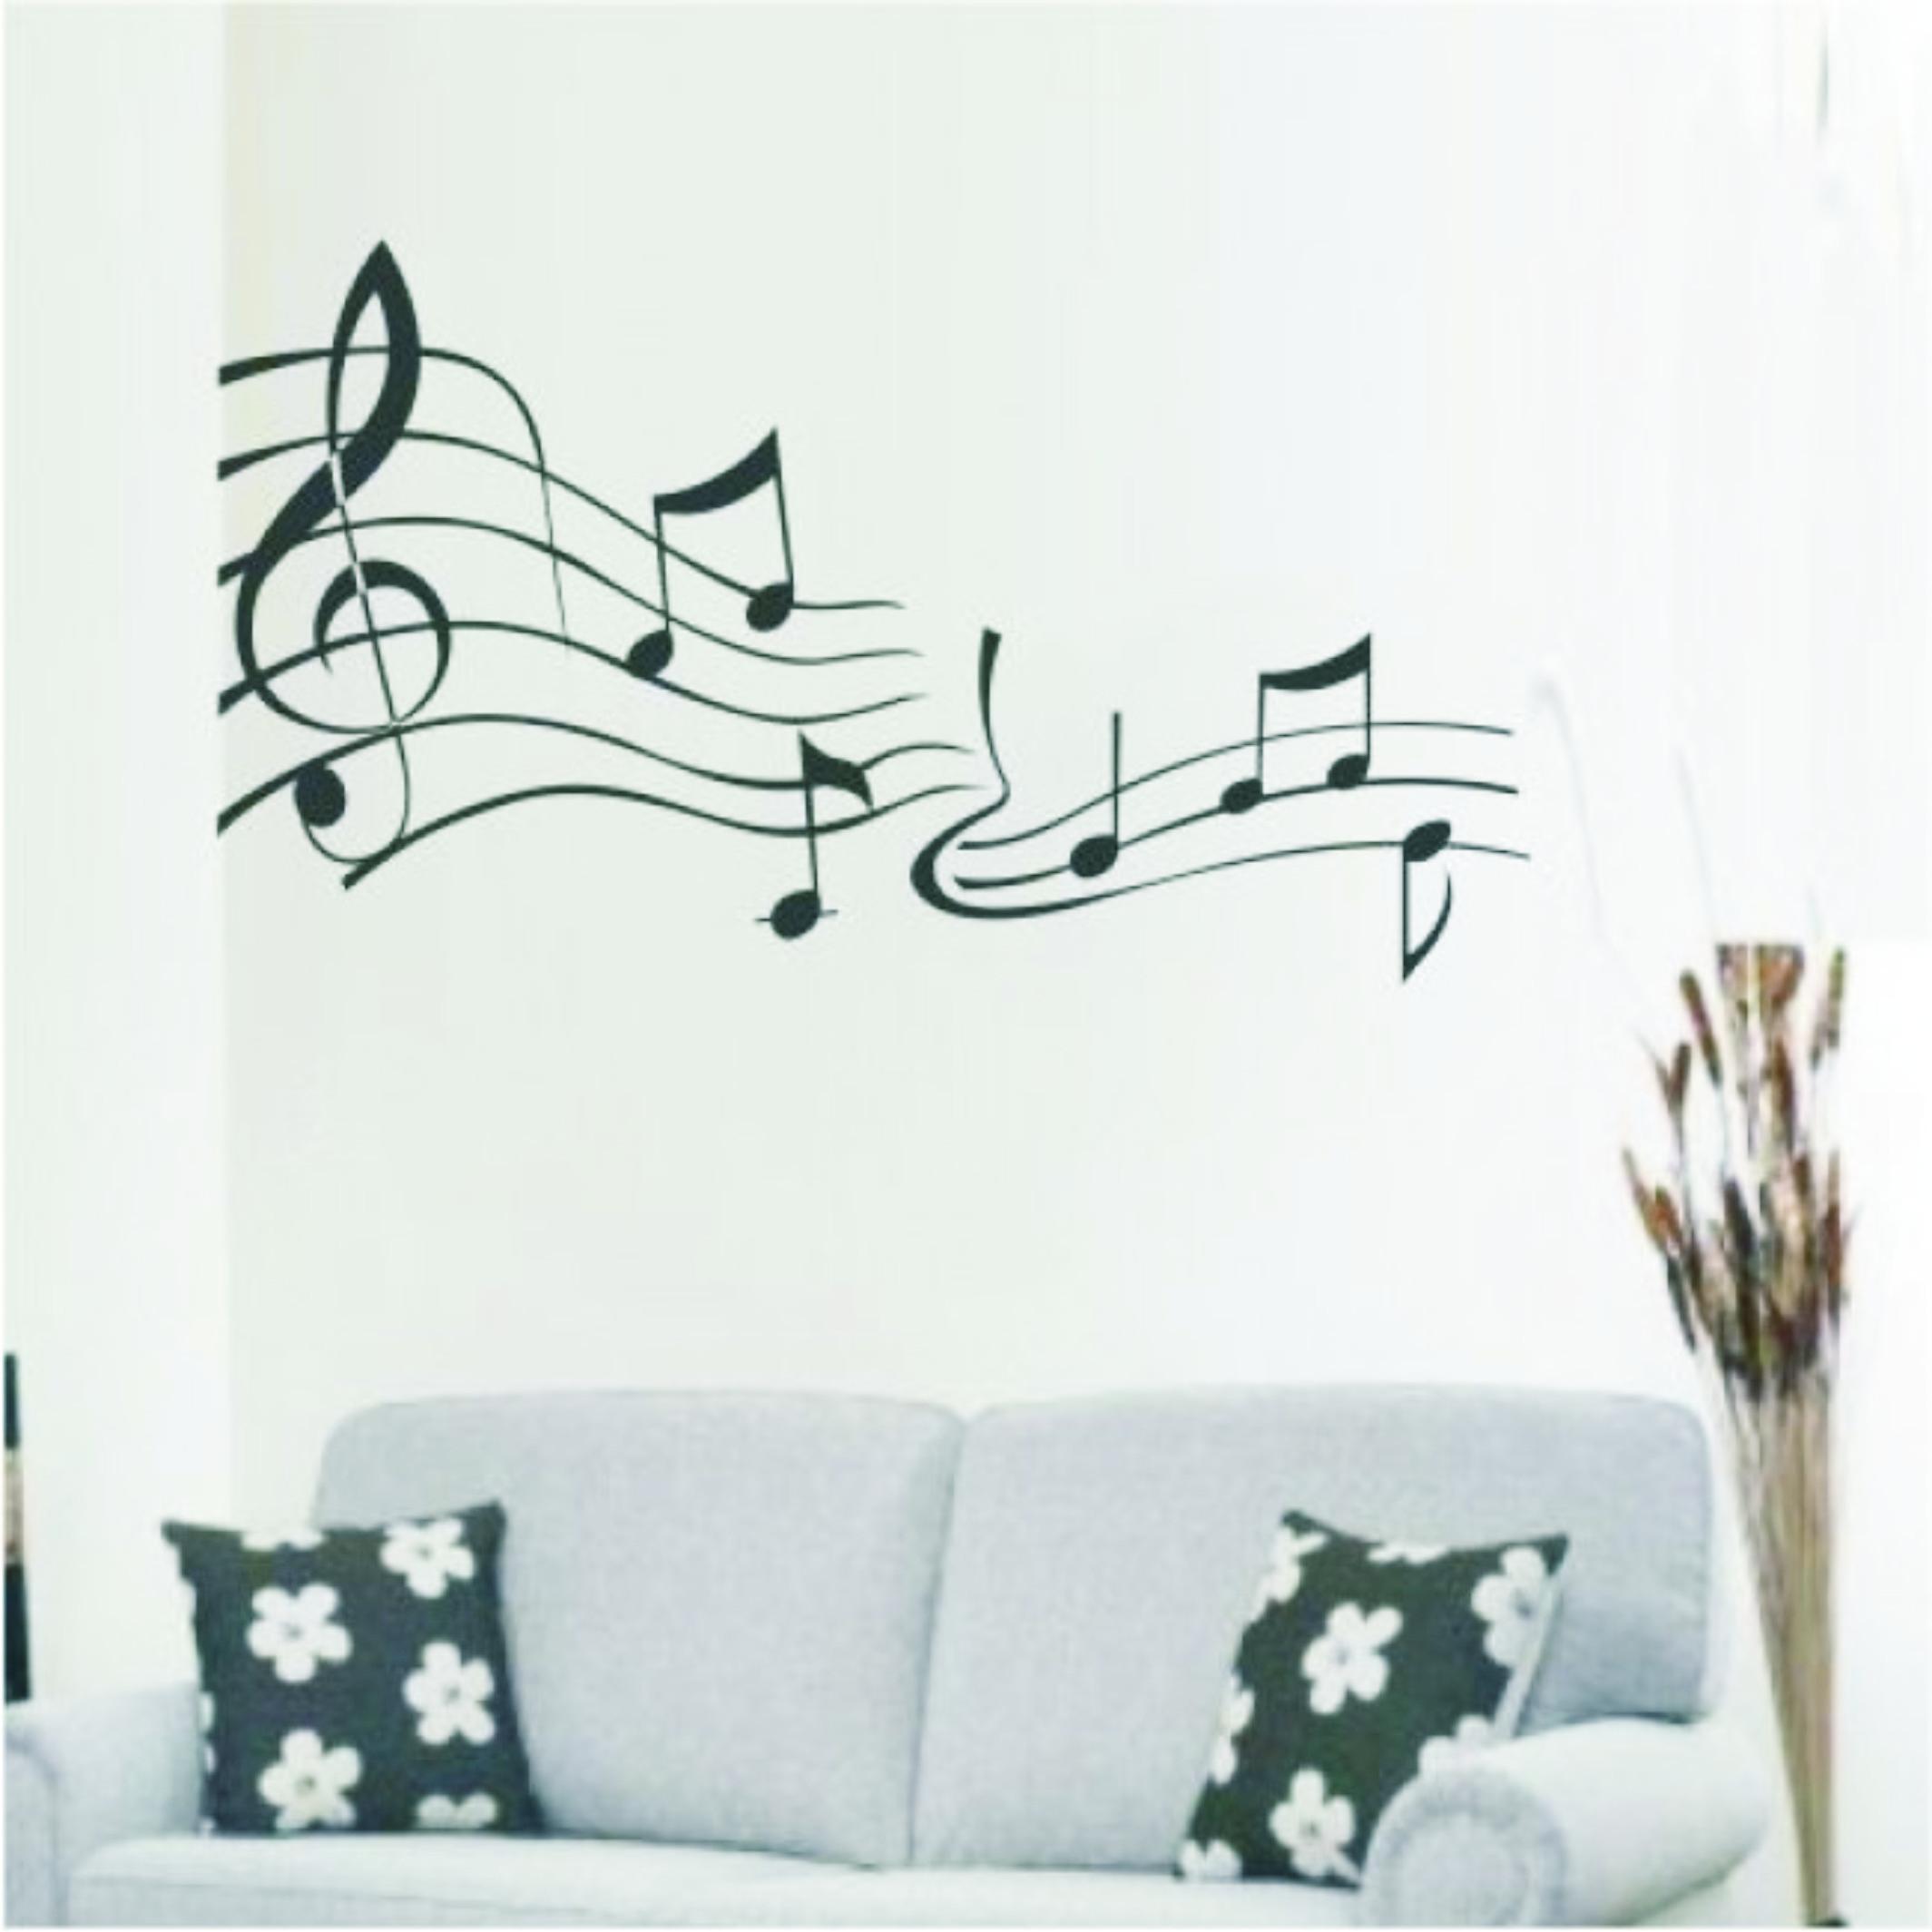 Tipos De Artesanato Gaúcho ~ Adesivo De Parede Partitura musical Adesivos de Parede Frete GRÁTIS Elo7